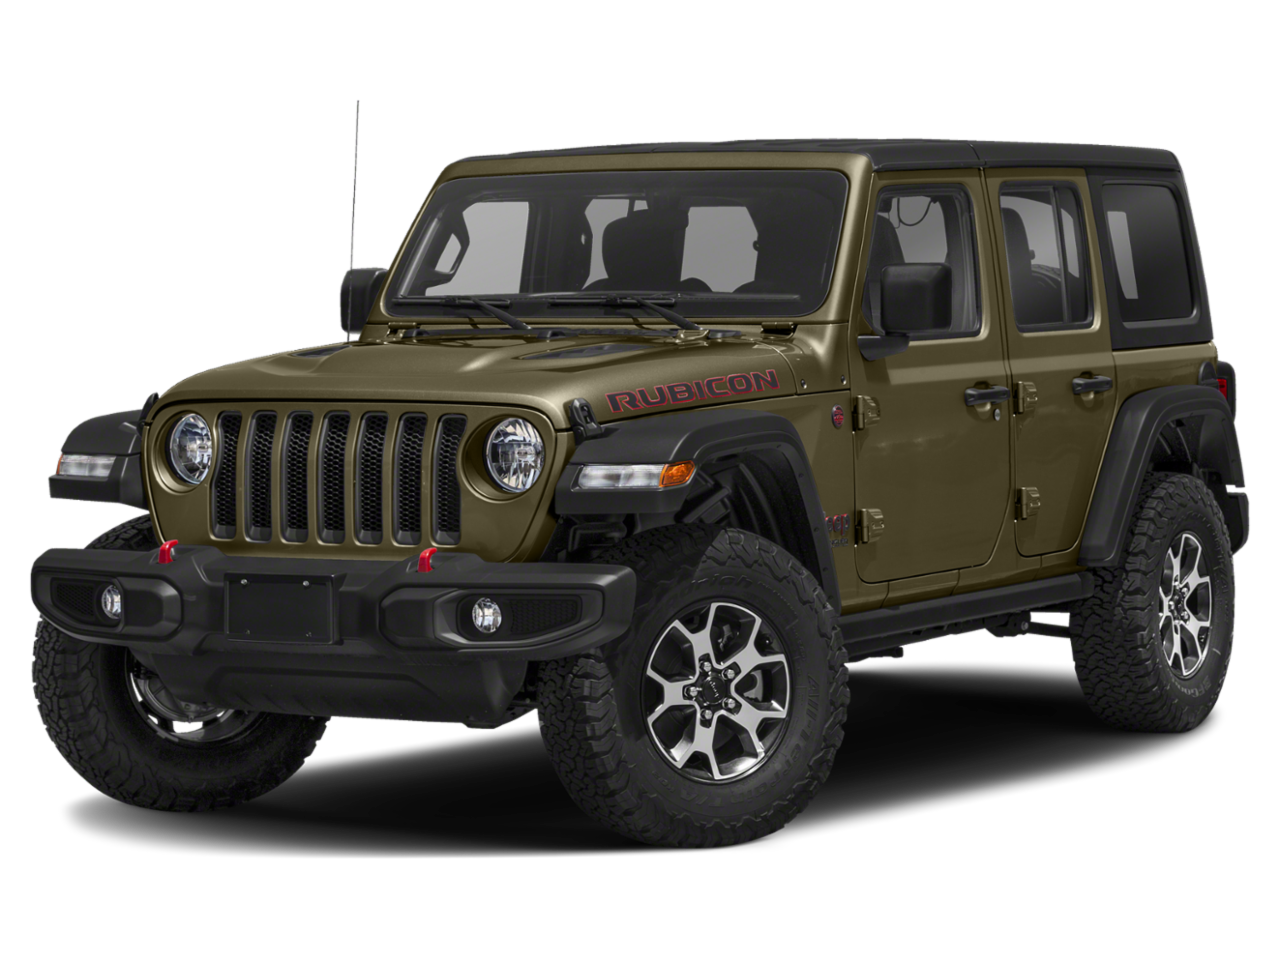 Jeep 2020 Wrangler Unlimited Rubicon